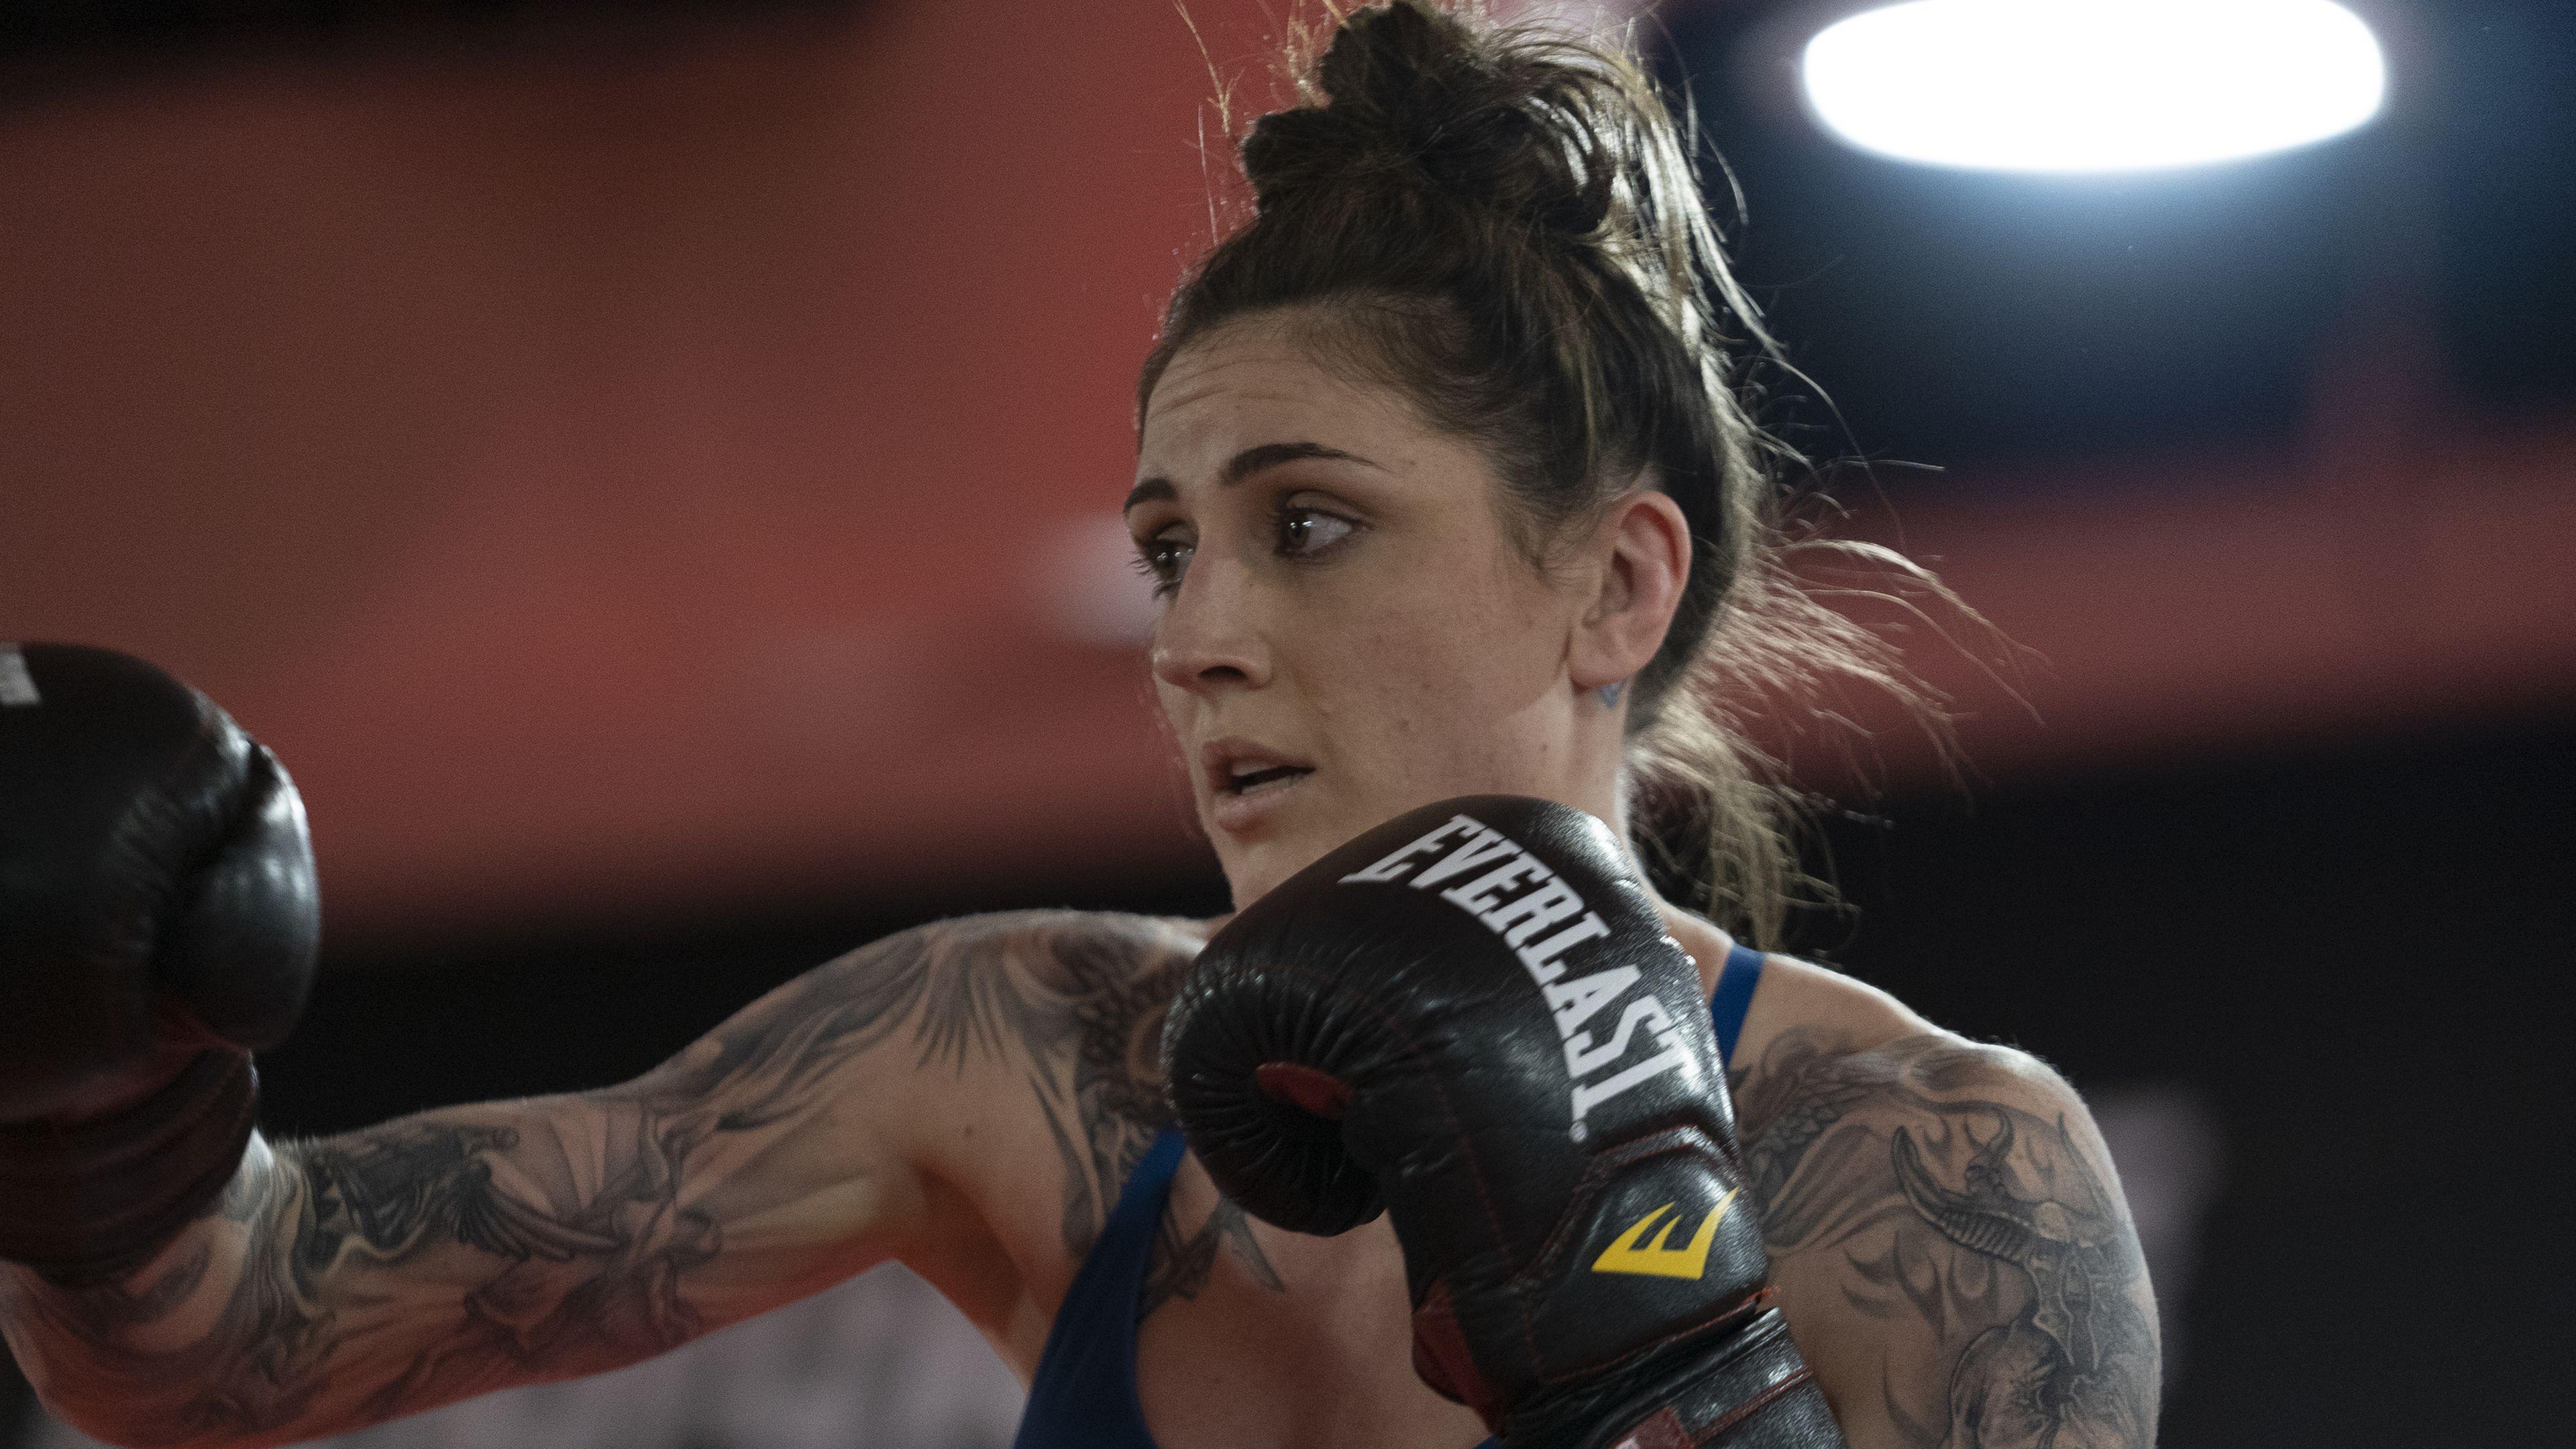 EXCLUSIVE: Megan Anderson ready for historic world title shot against Amanda Nunes